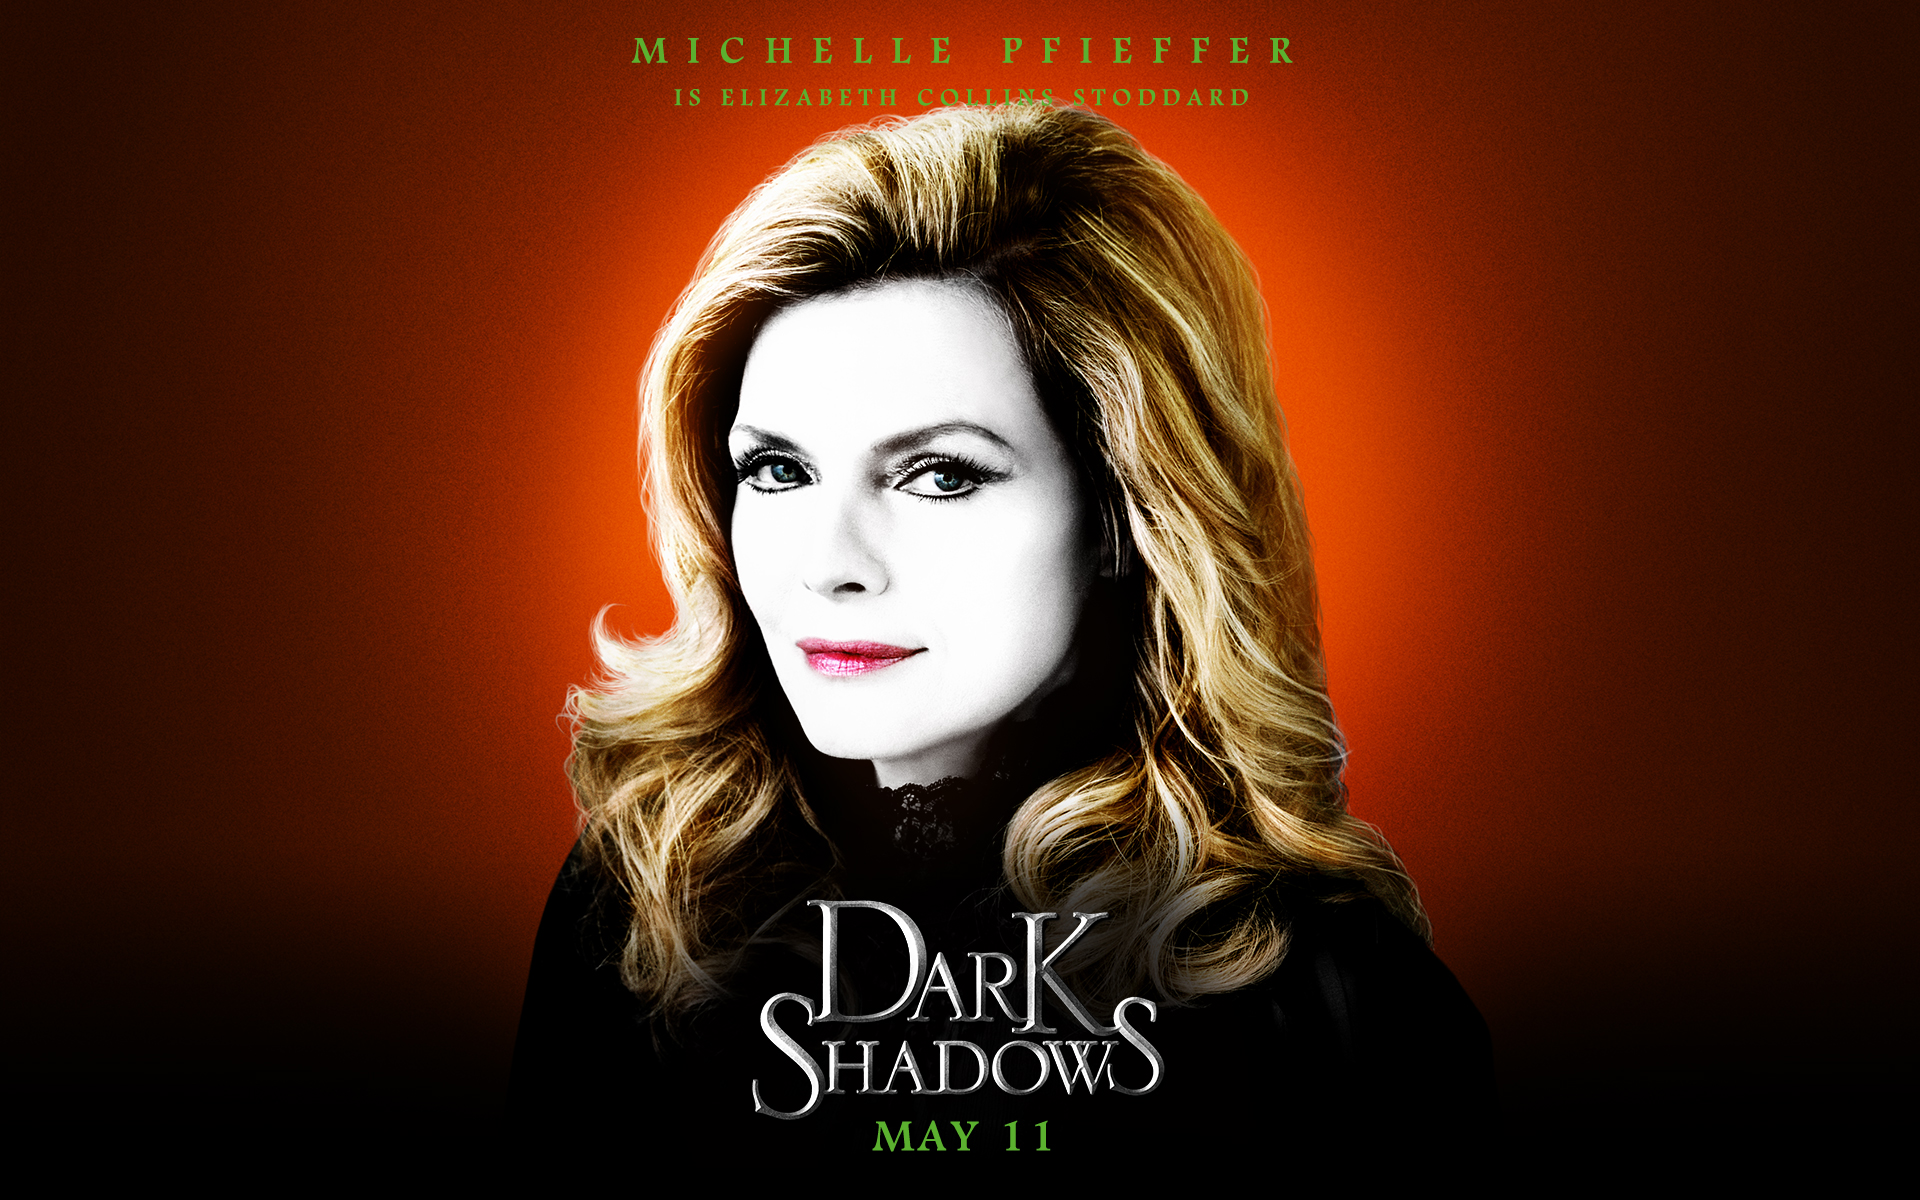 Dark Shadows wallpapers 19201200 Michelle Pfeiffer as Elizabeth 1920x1200